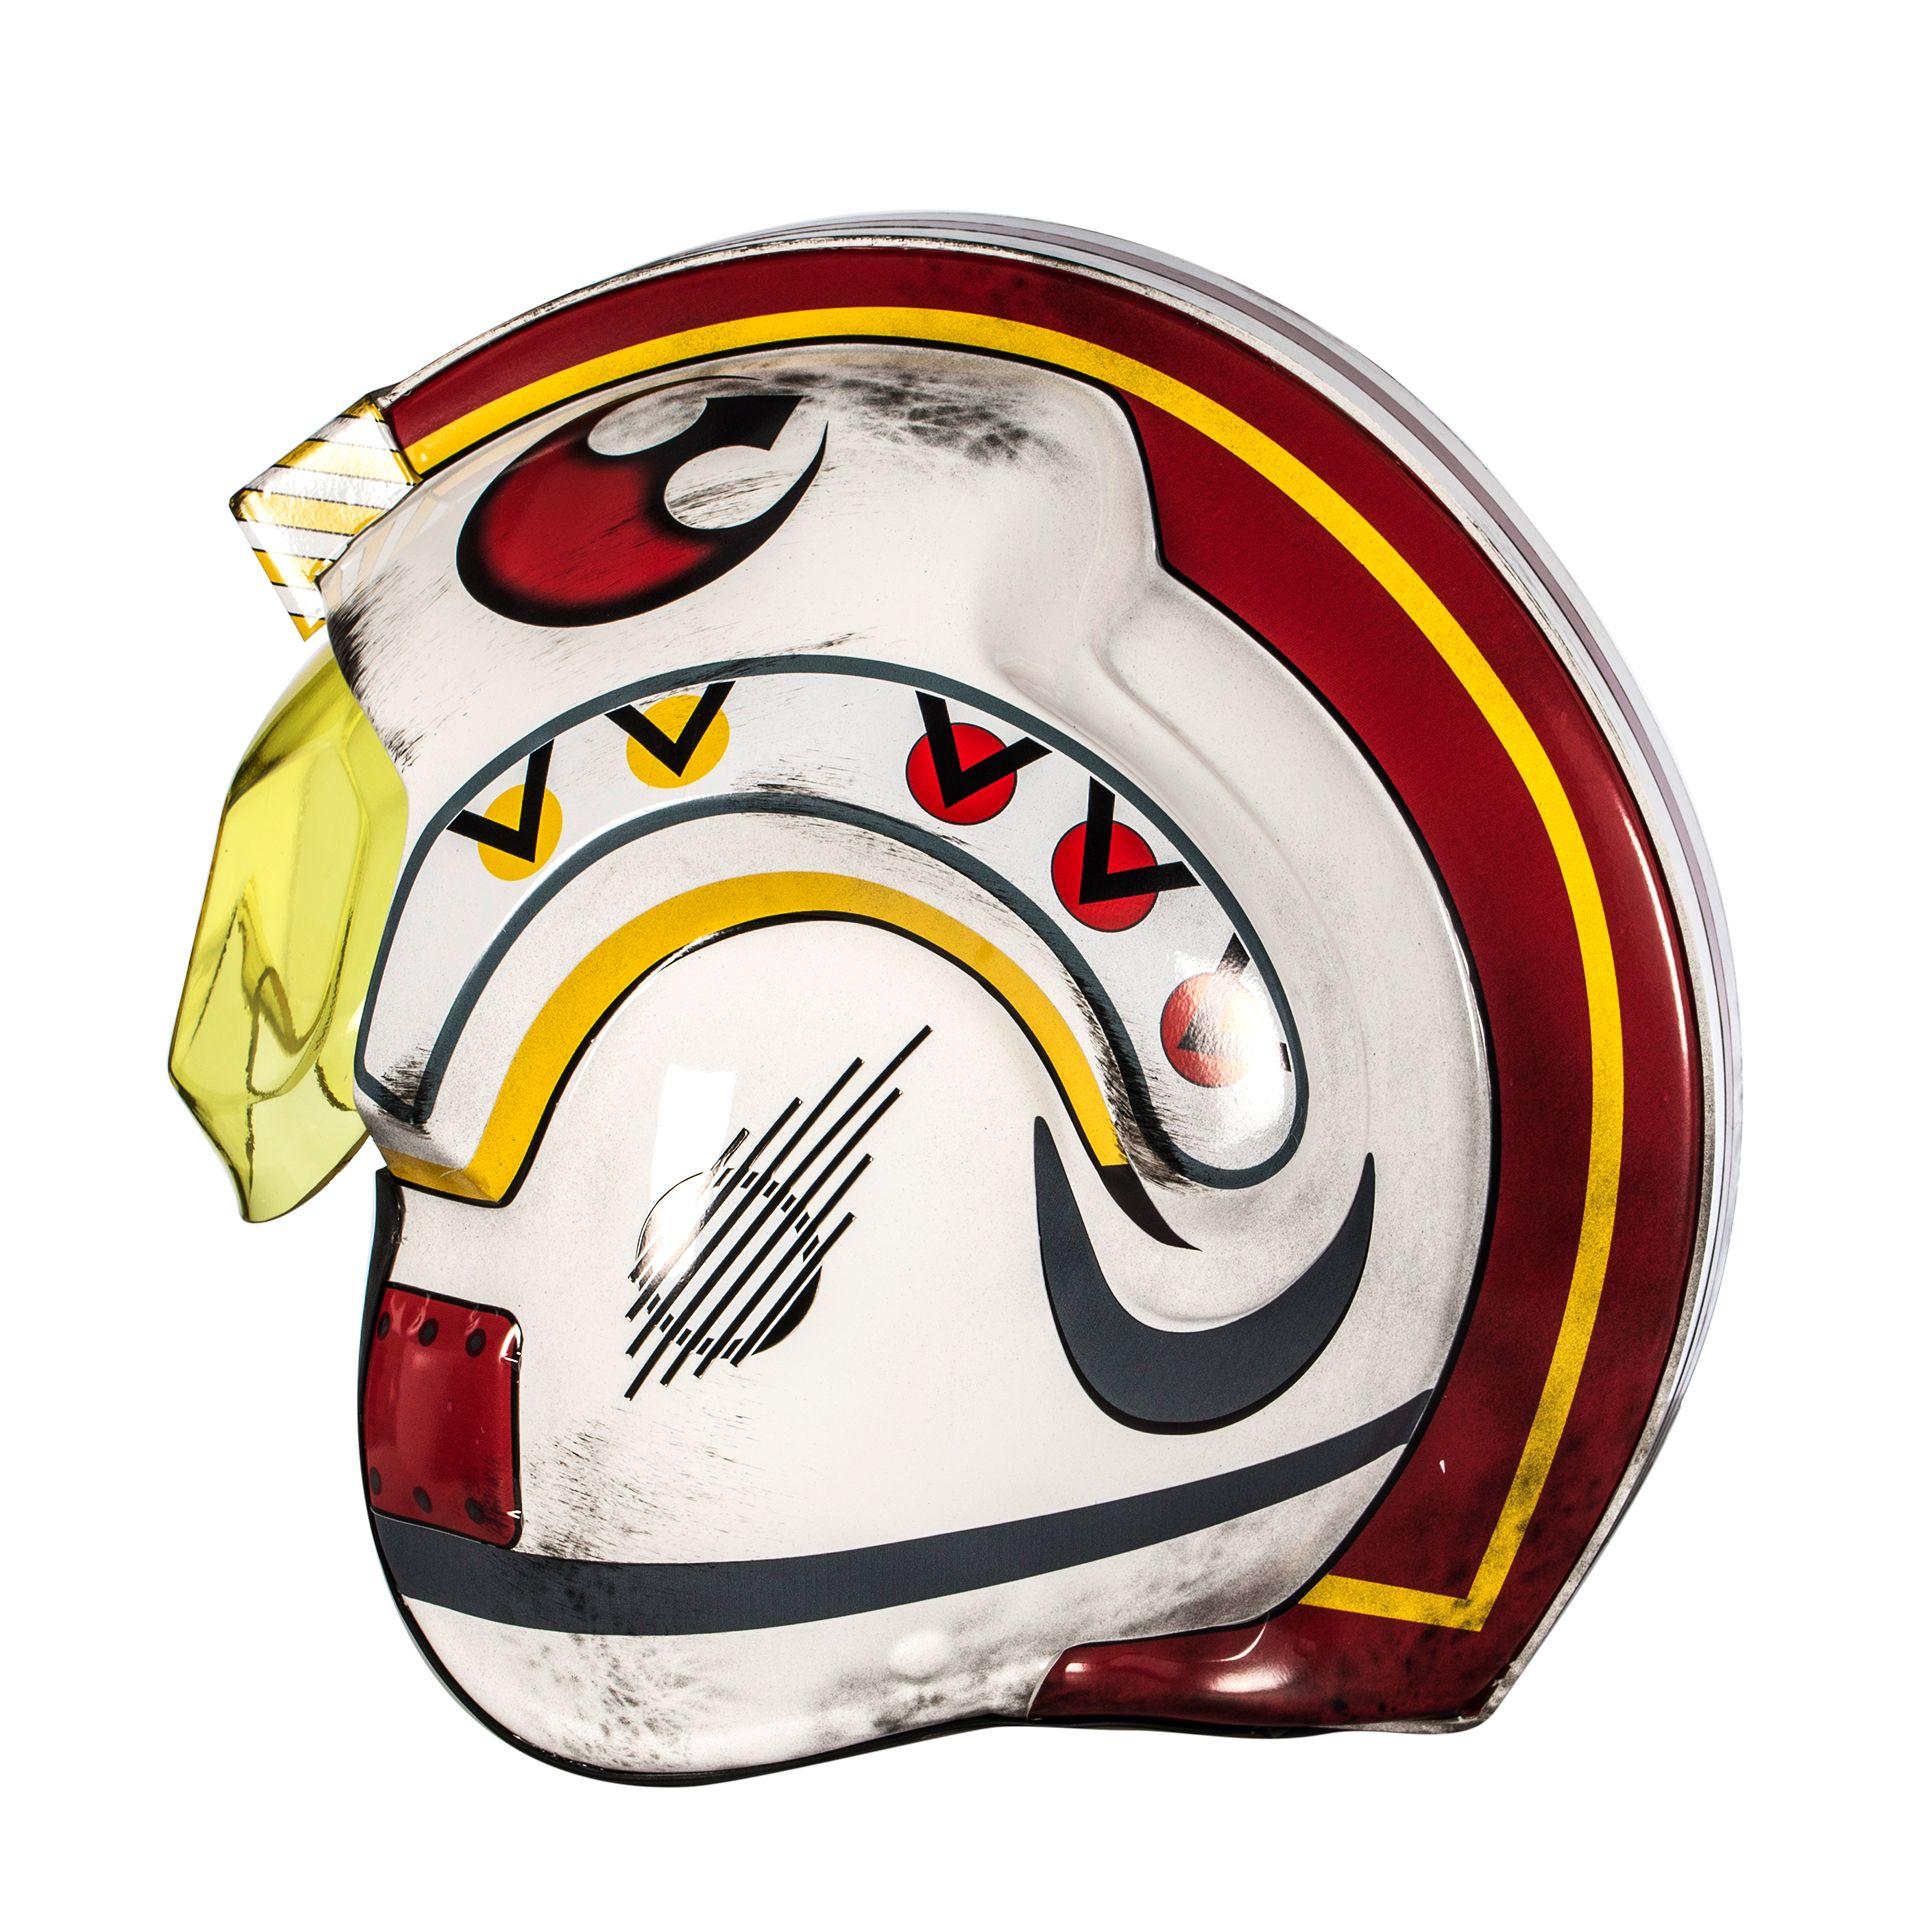 1920x1920 Rebel Pilot X Wing Painted Helmet